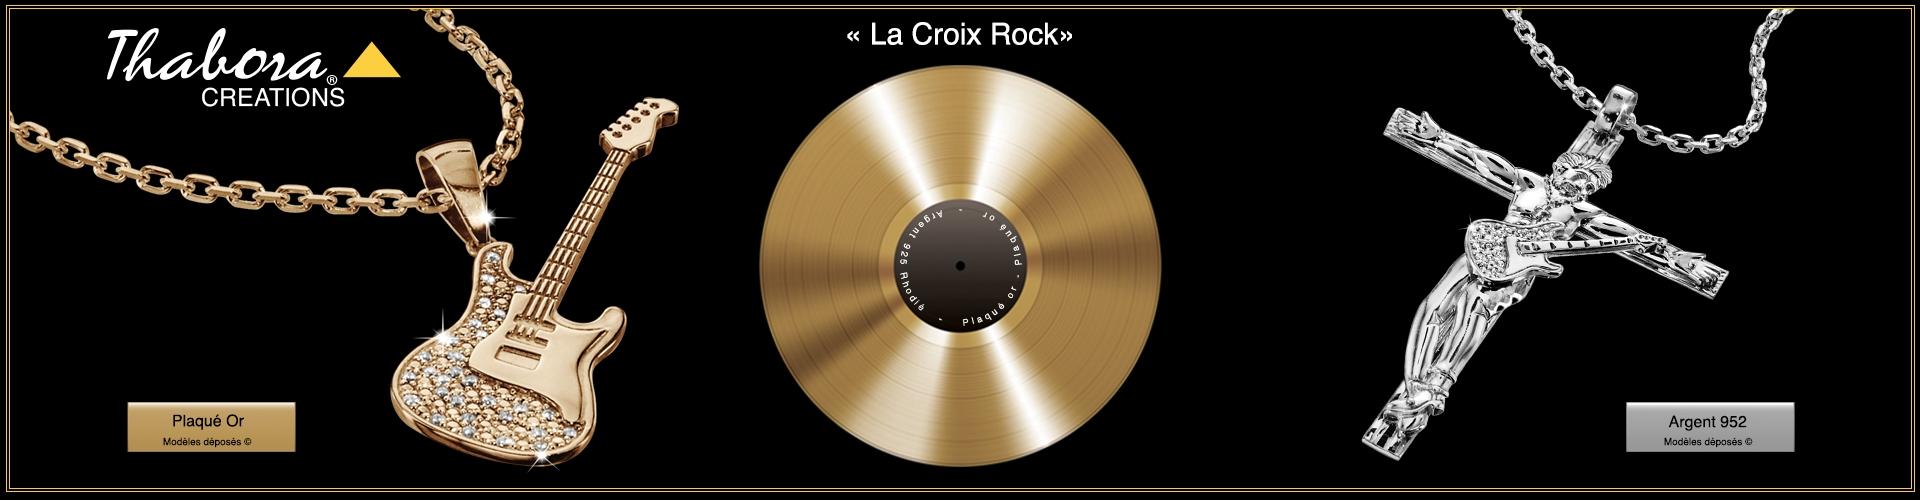 slide-croix-rock